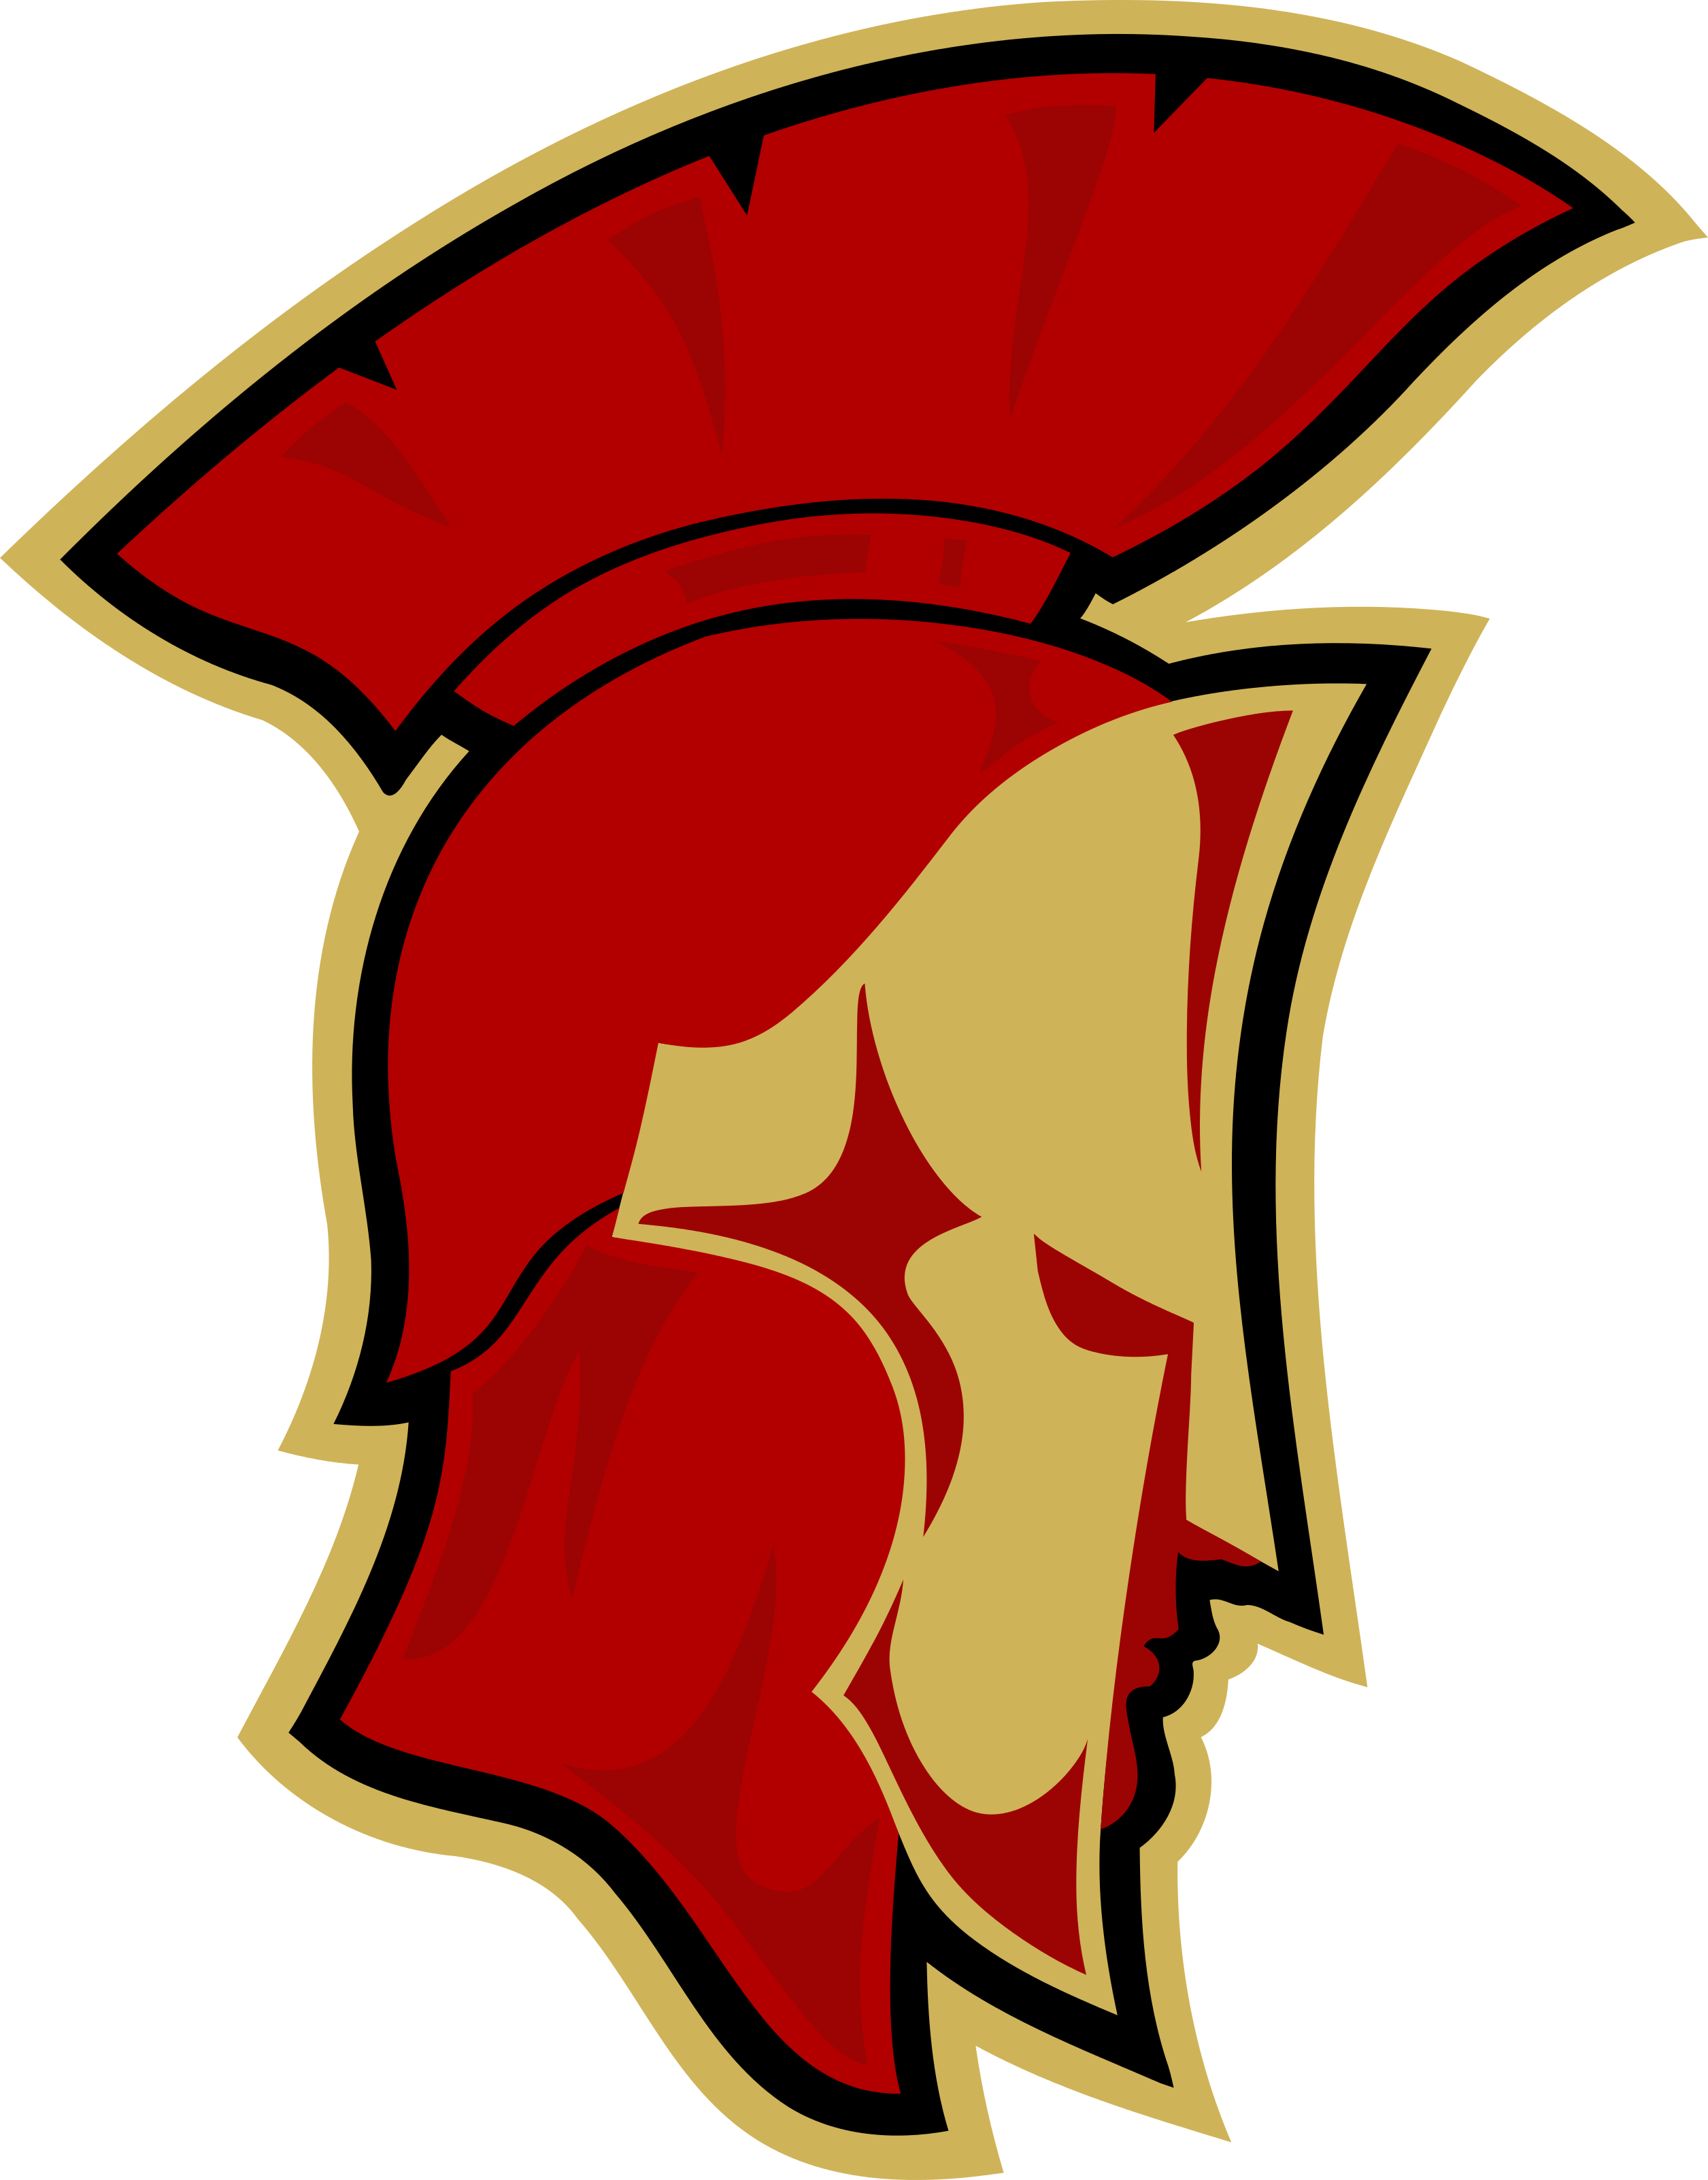 Warrior clipart warrior head. March cbc calvary university